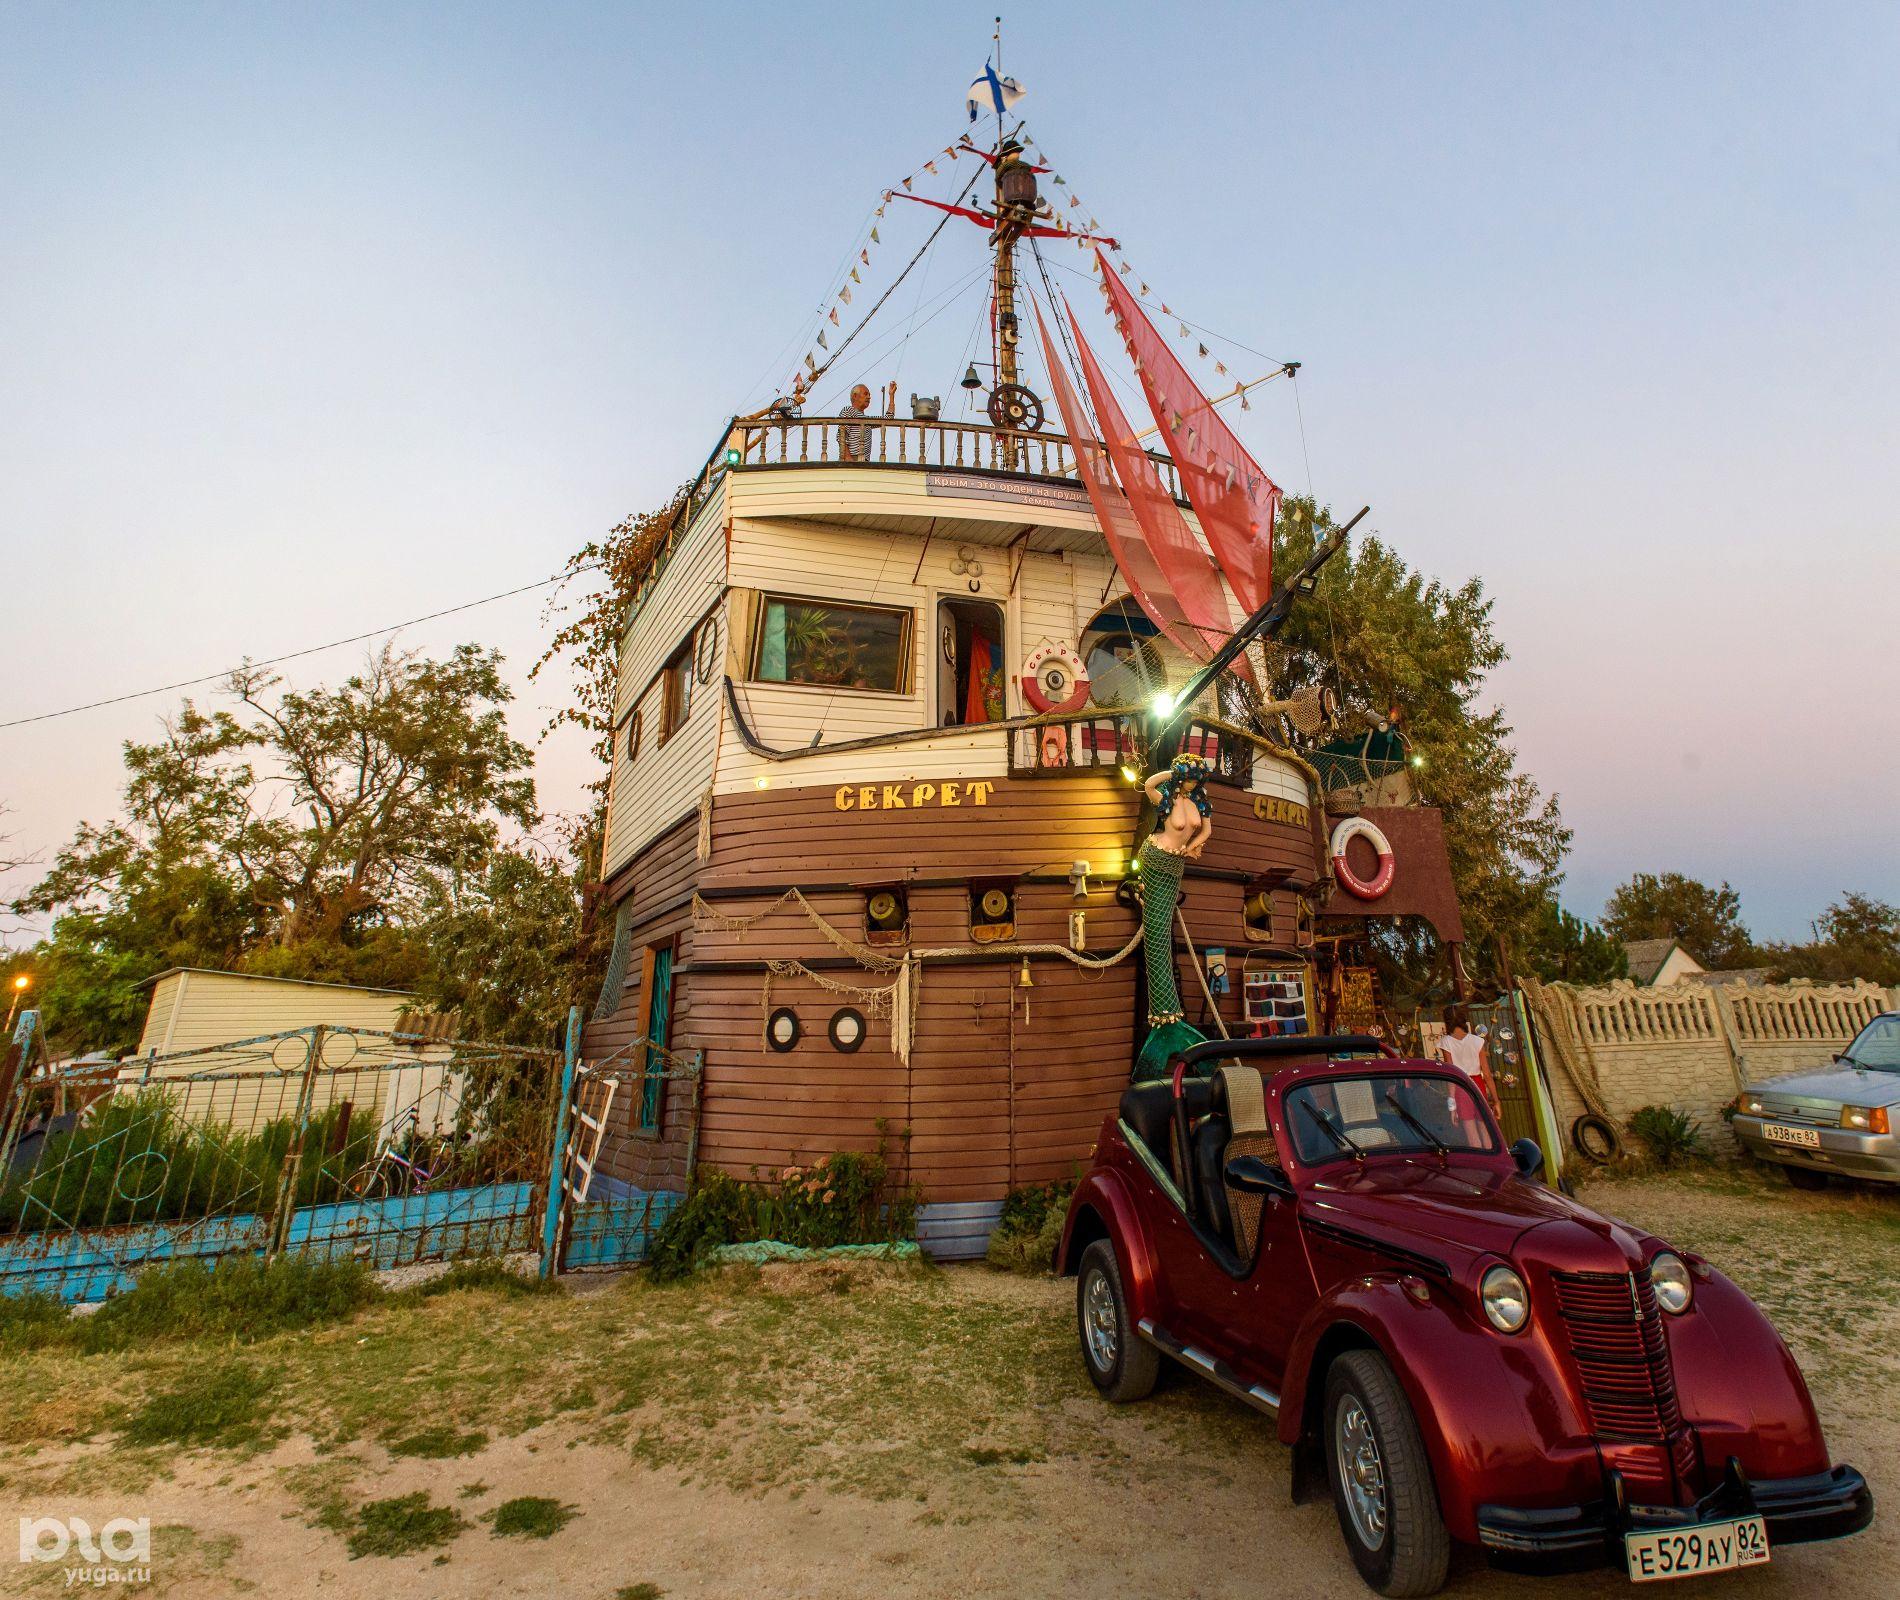 Дом-корабль в Русской бухте ©Фото Дмитрия Андреева, Юга.ру